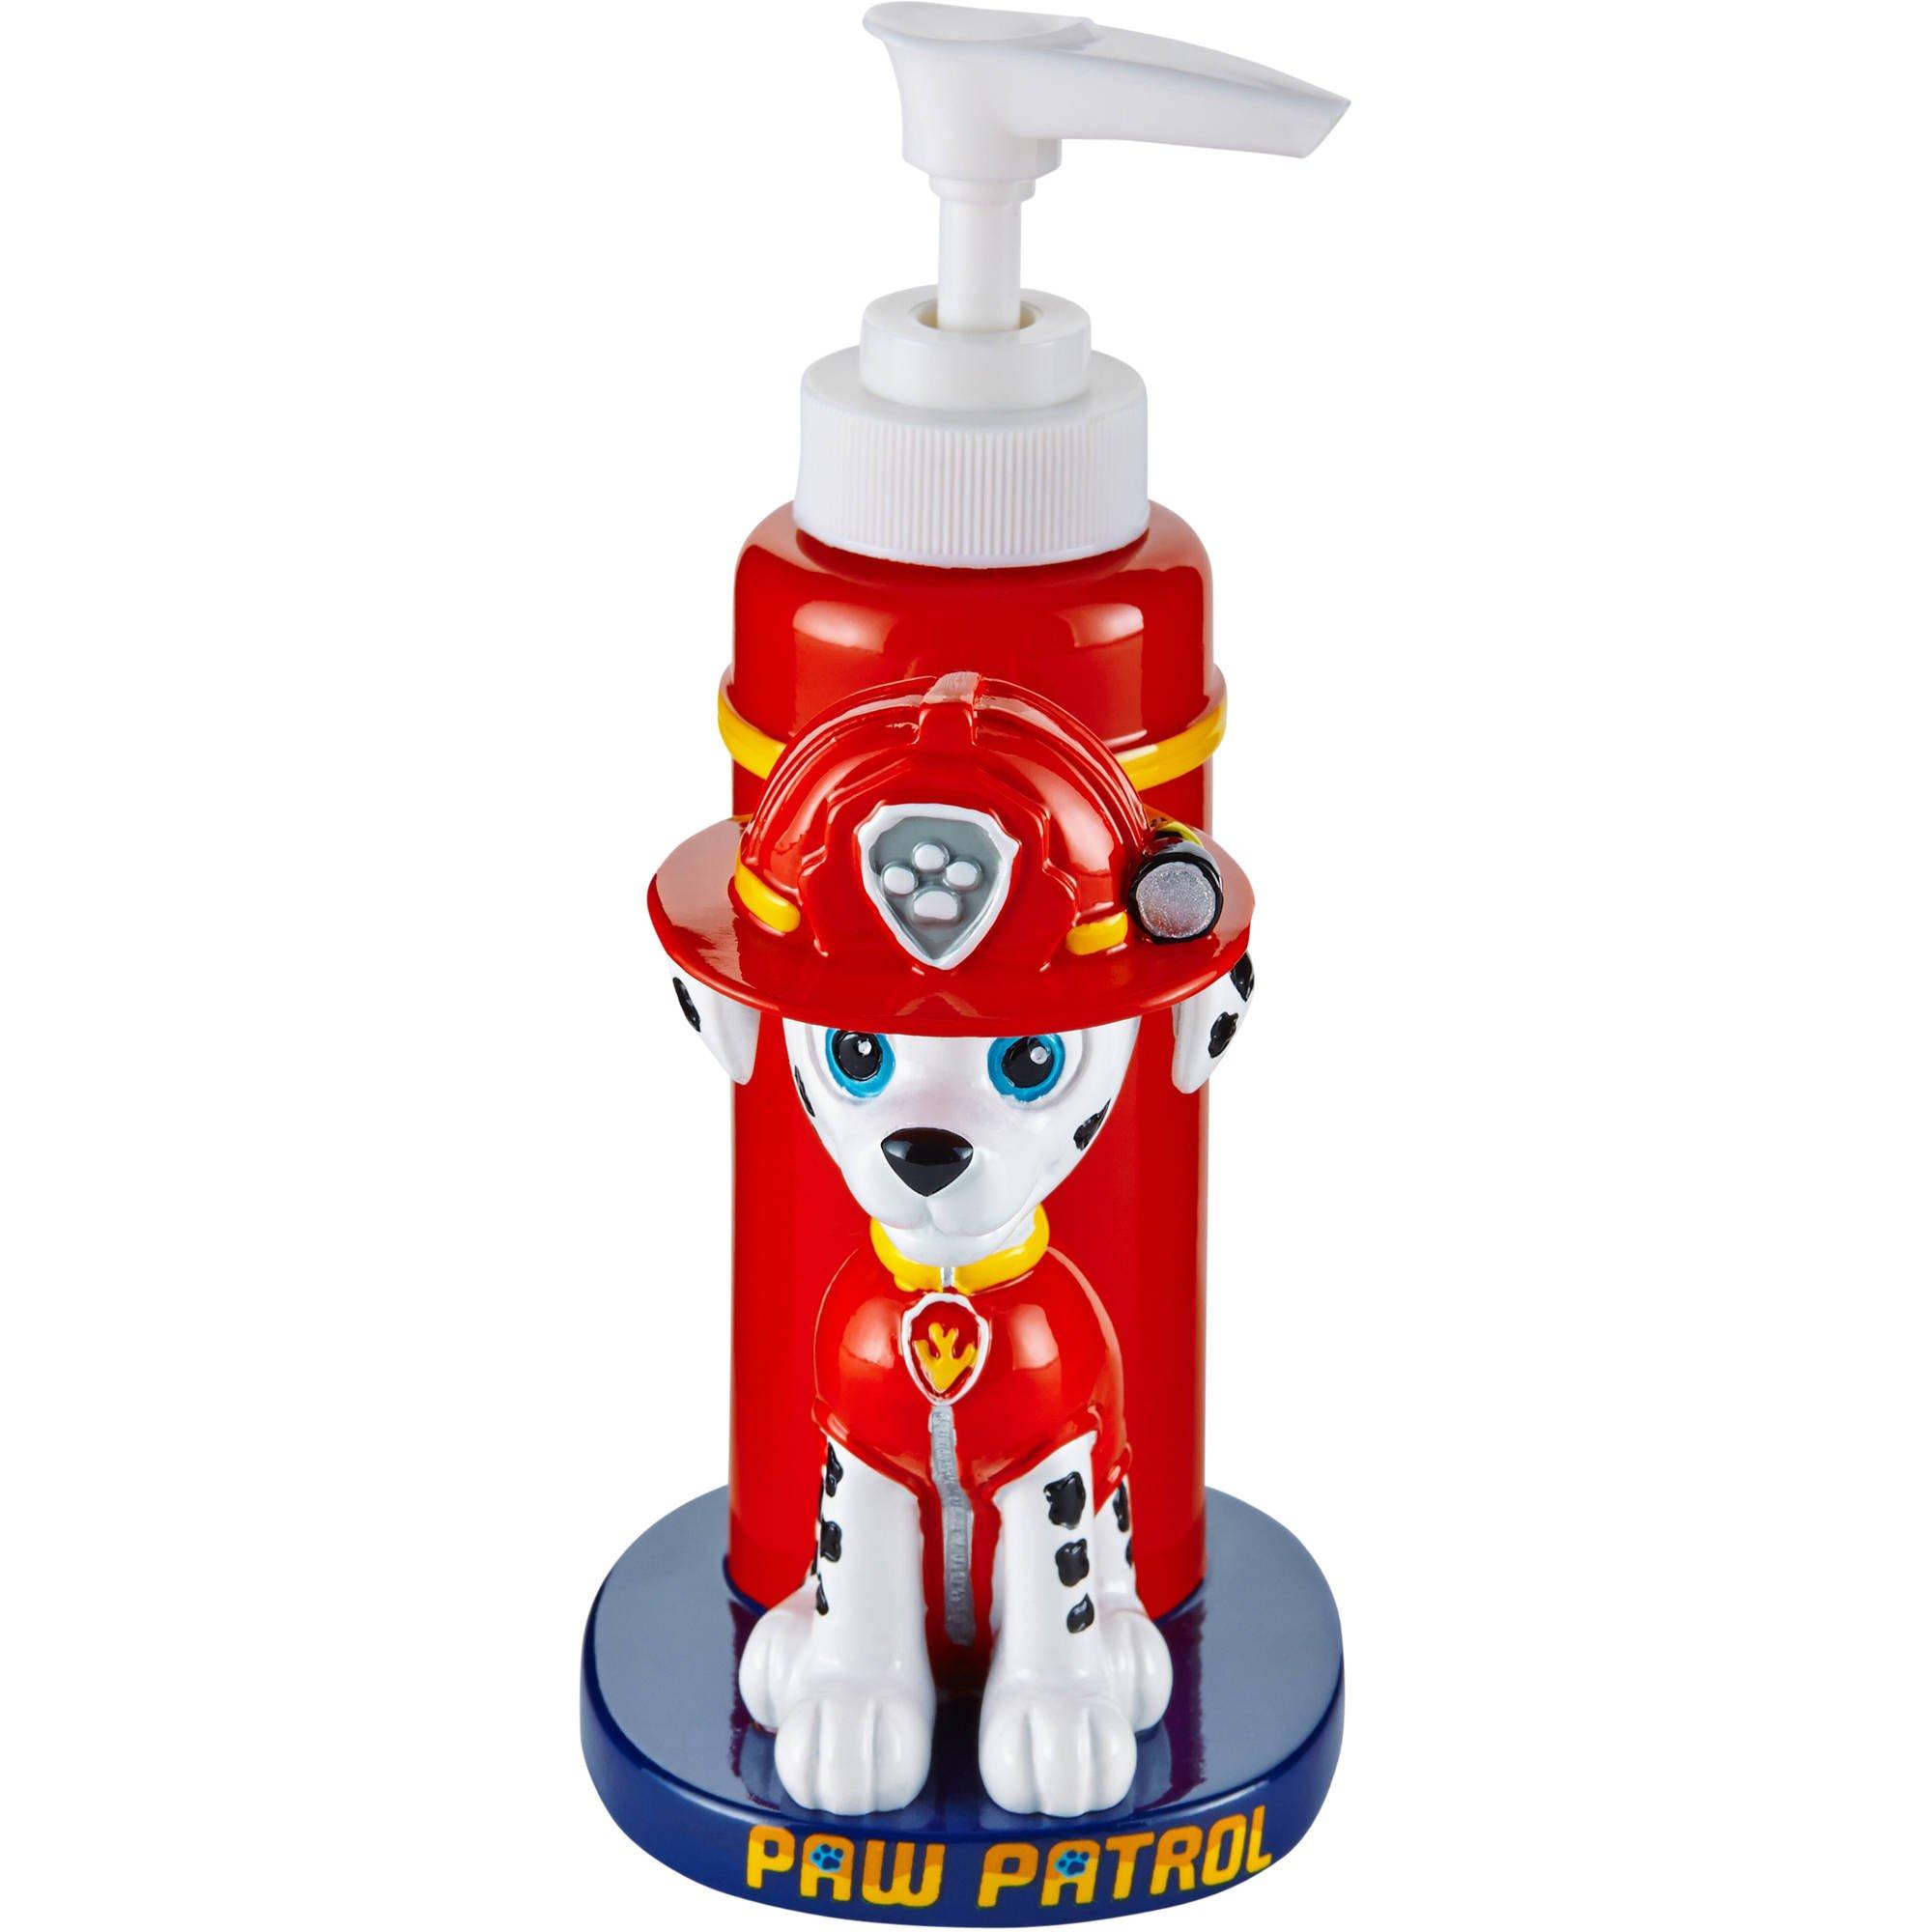 Paw Patrol Soap or Lotion Dispenser